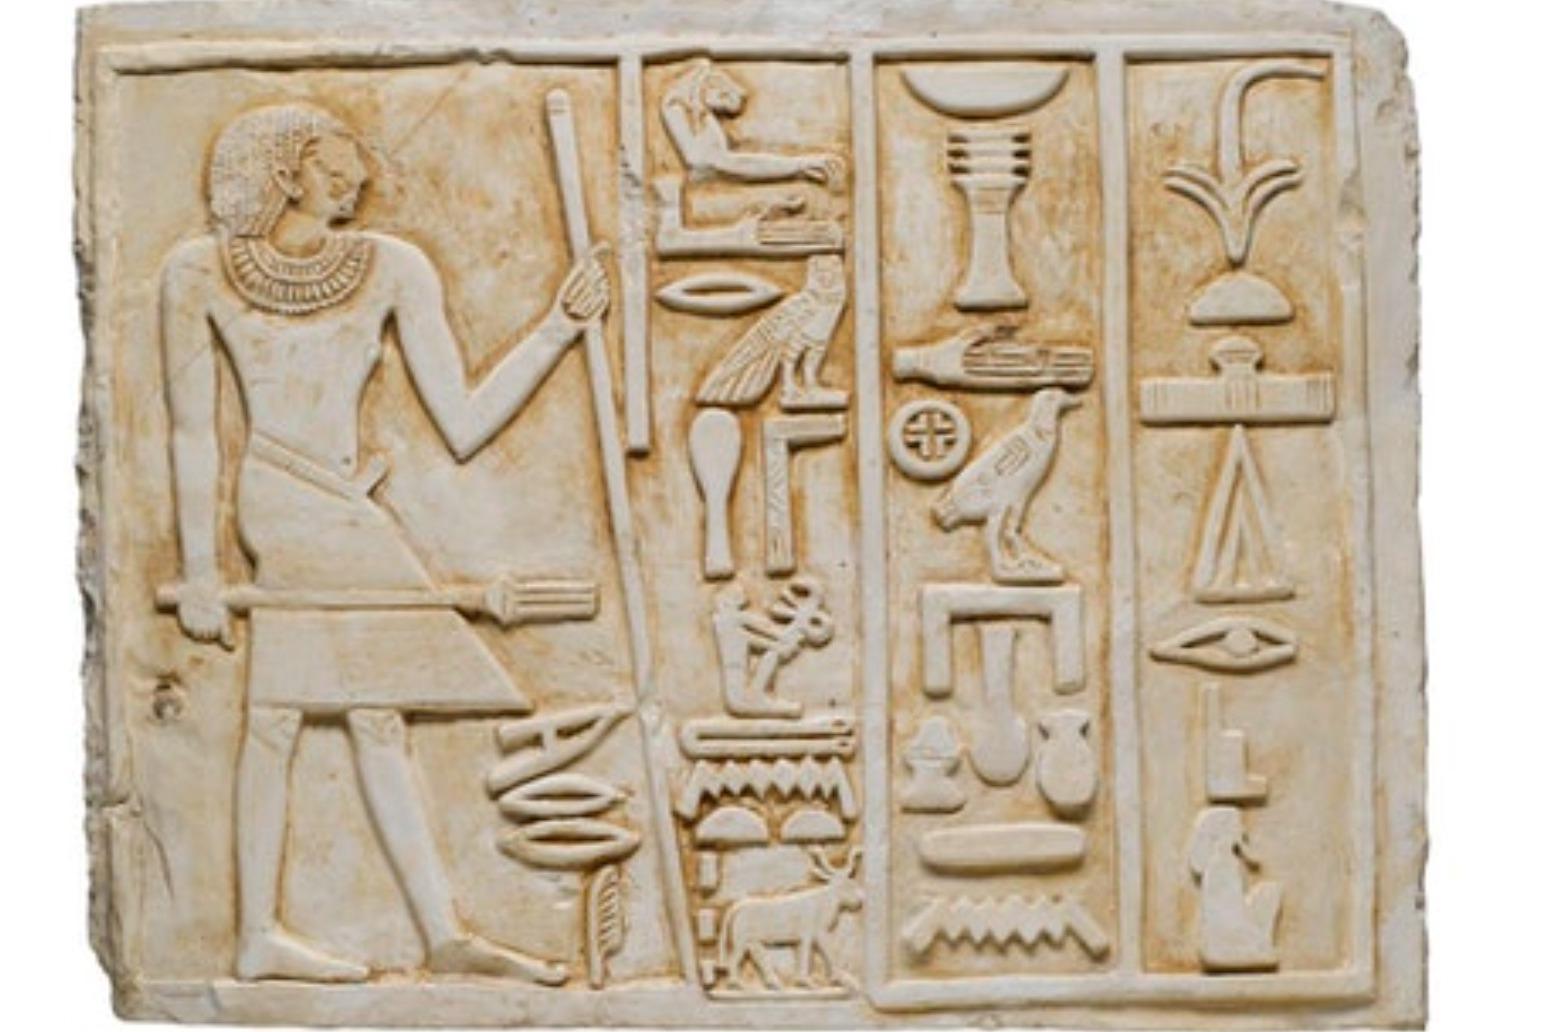 Egypt unveils ancient coffins and mummies found in huge necropolis